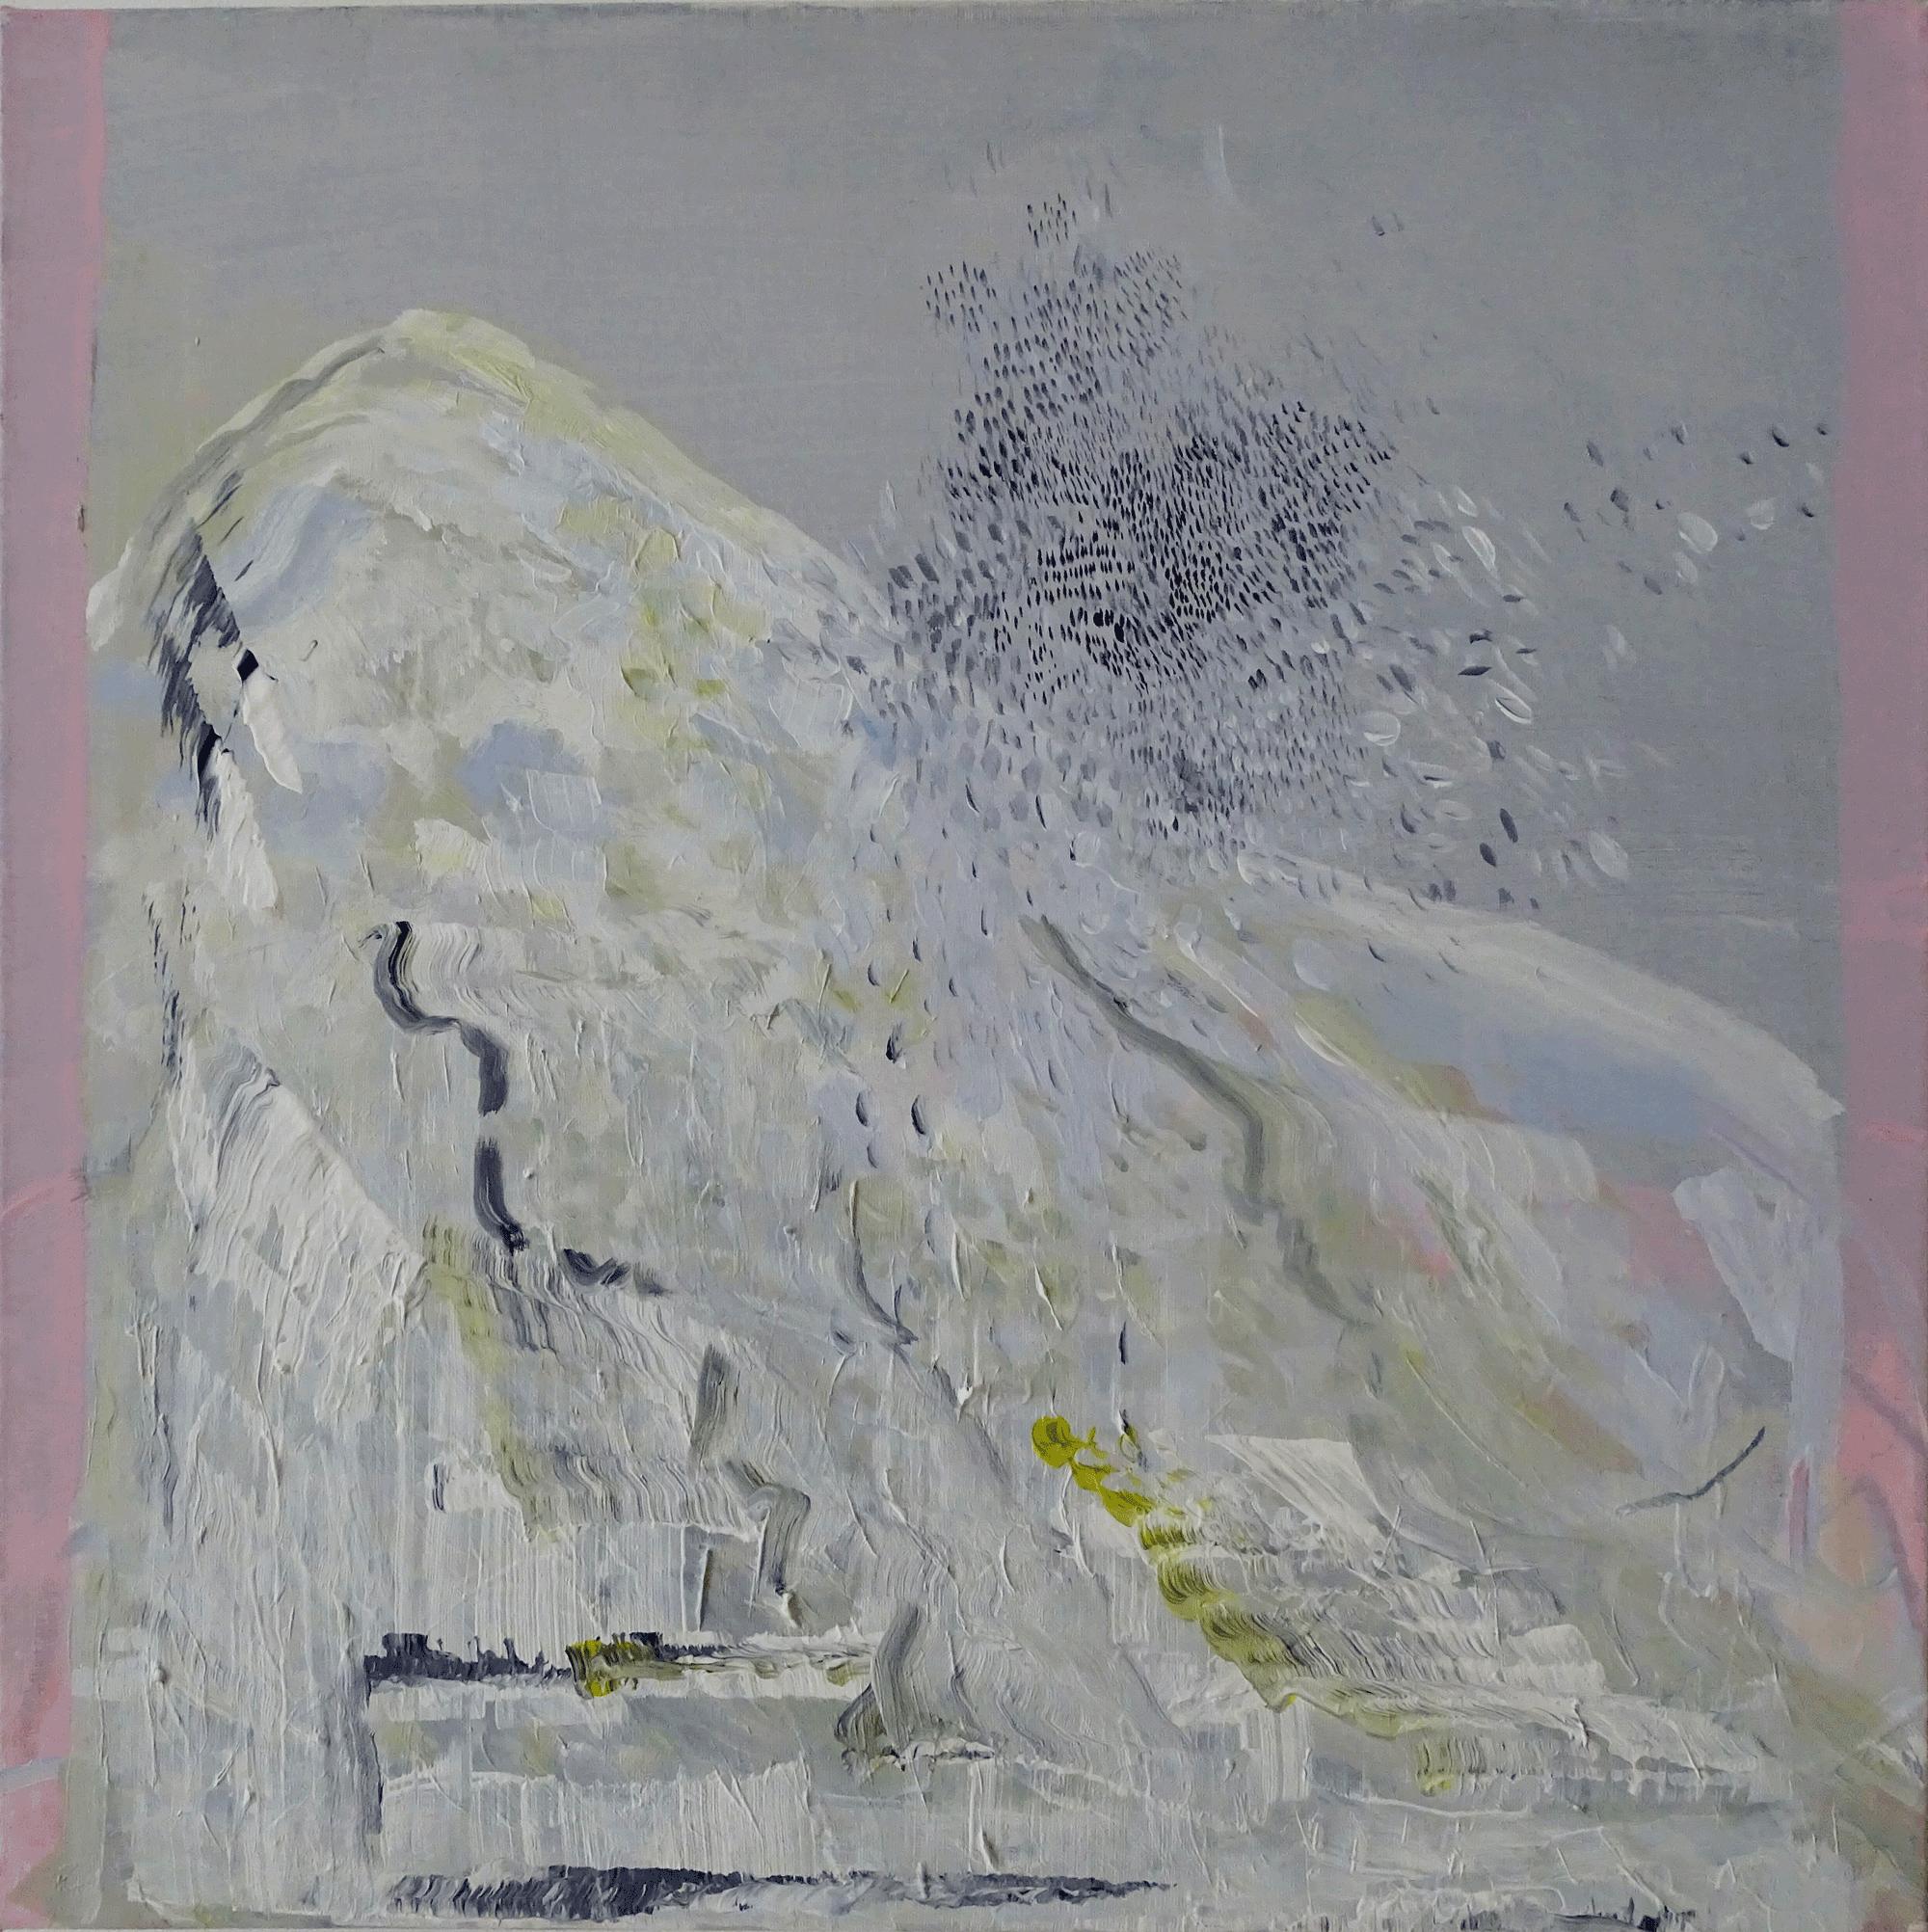 Yvonne Andreini, Up Up Up, 2019, 40 x 40 cm, Acryl auf Leinwand